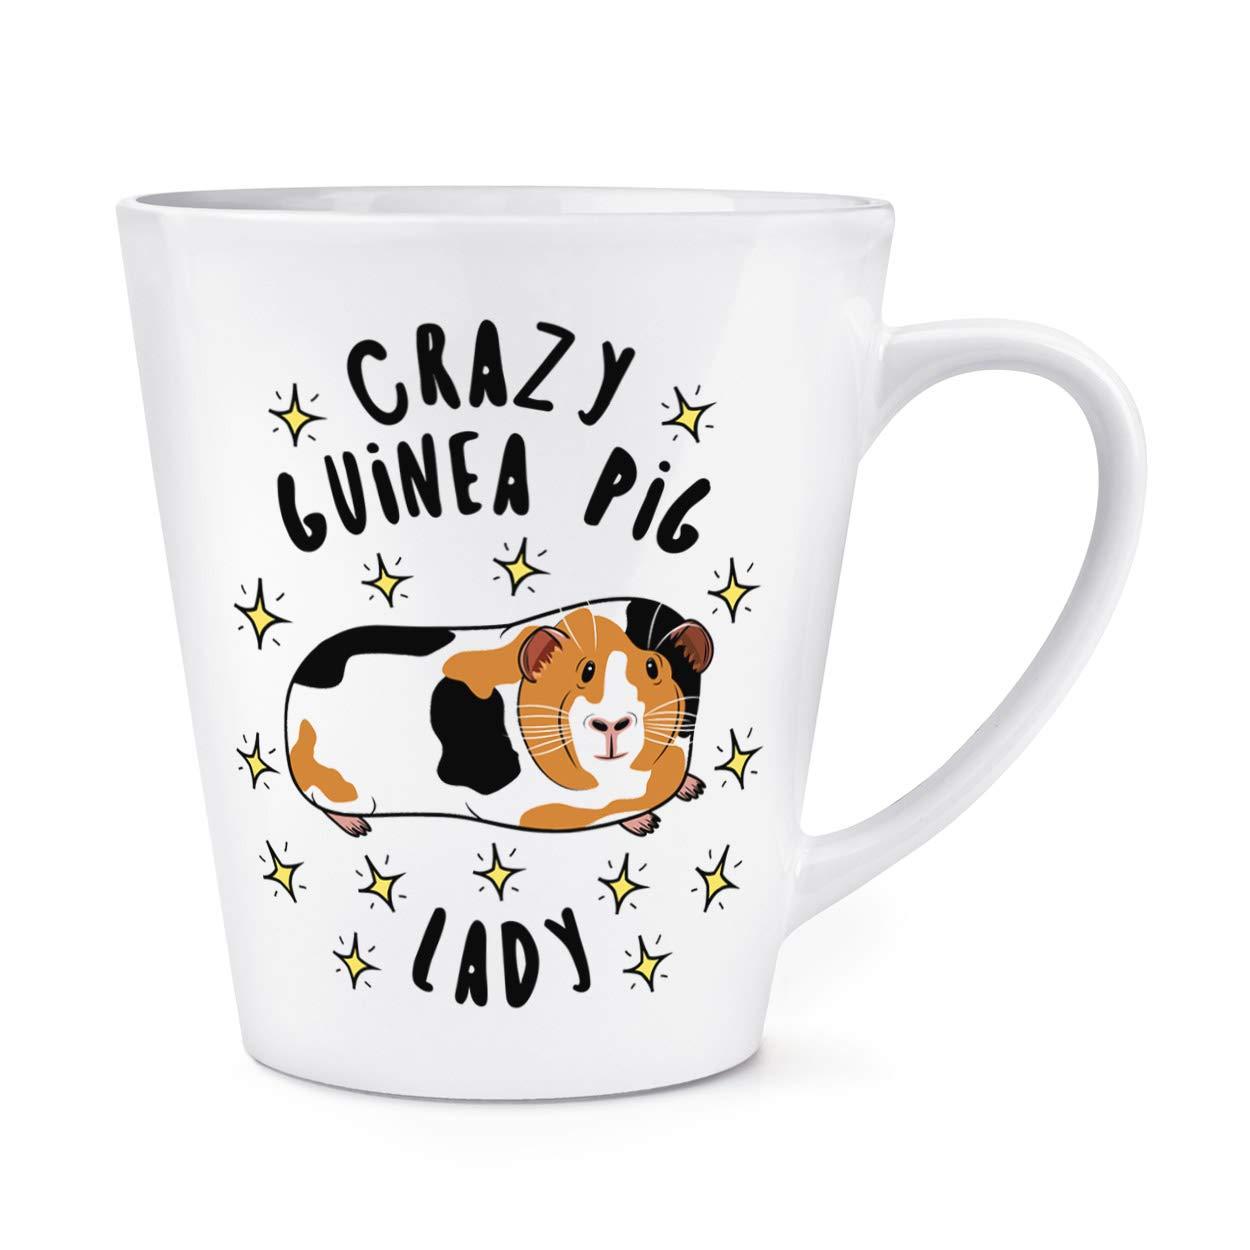 Crazy Guinea Pig Lady Stars 12oz Latte Mug Cup Gift Base®